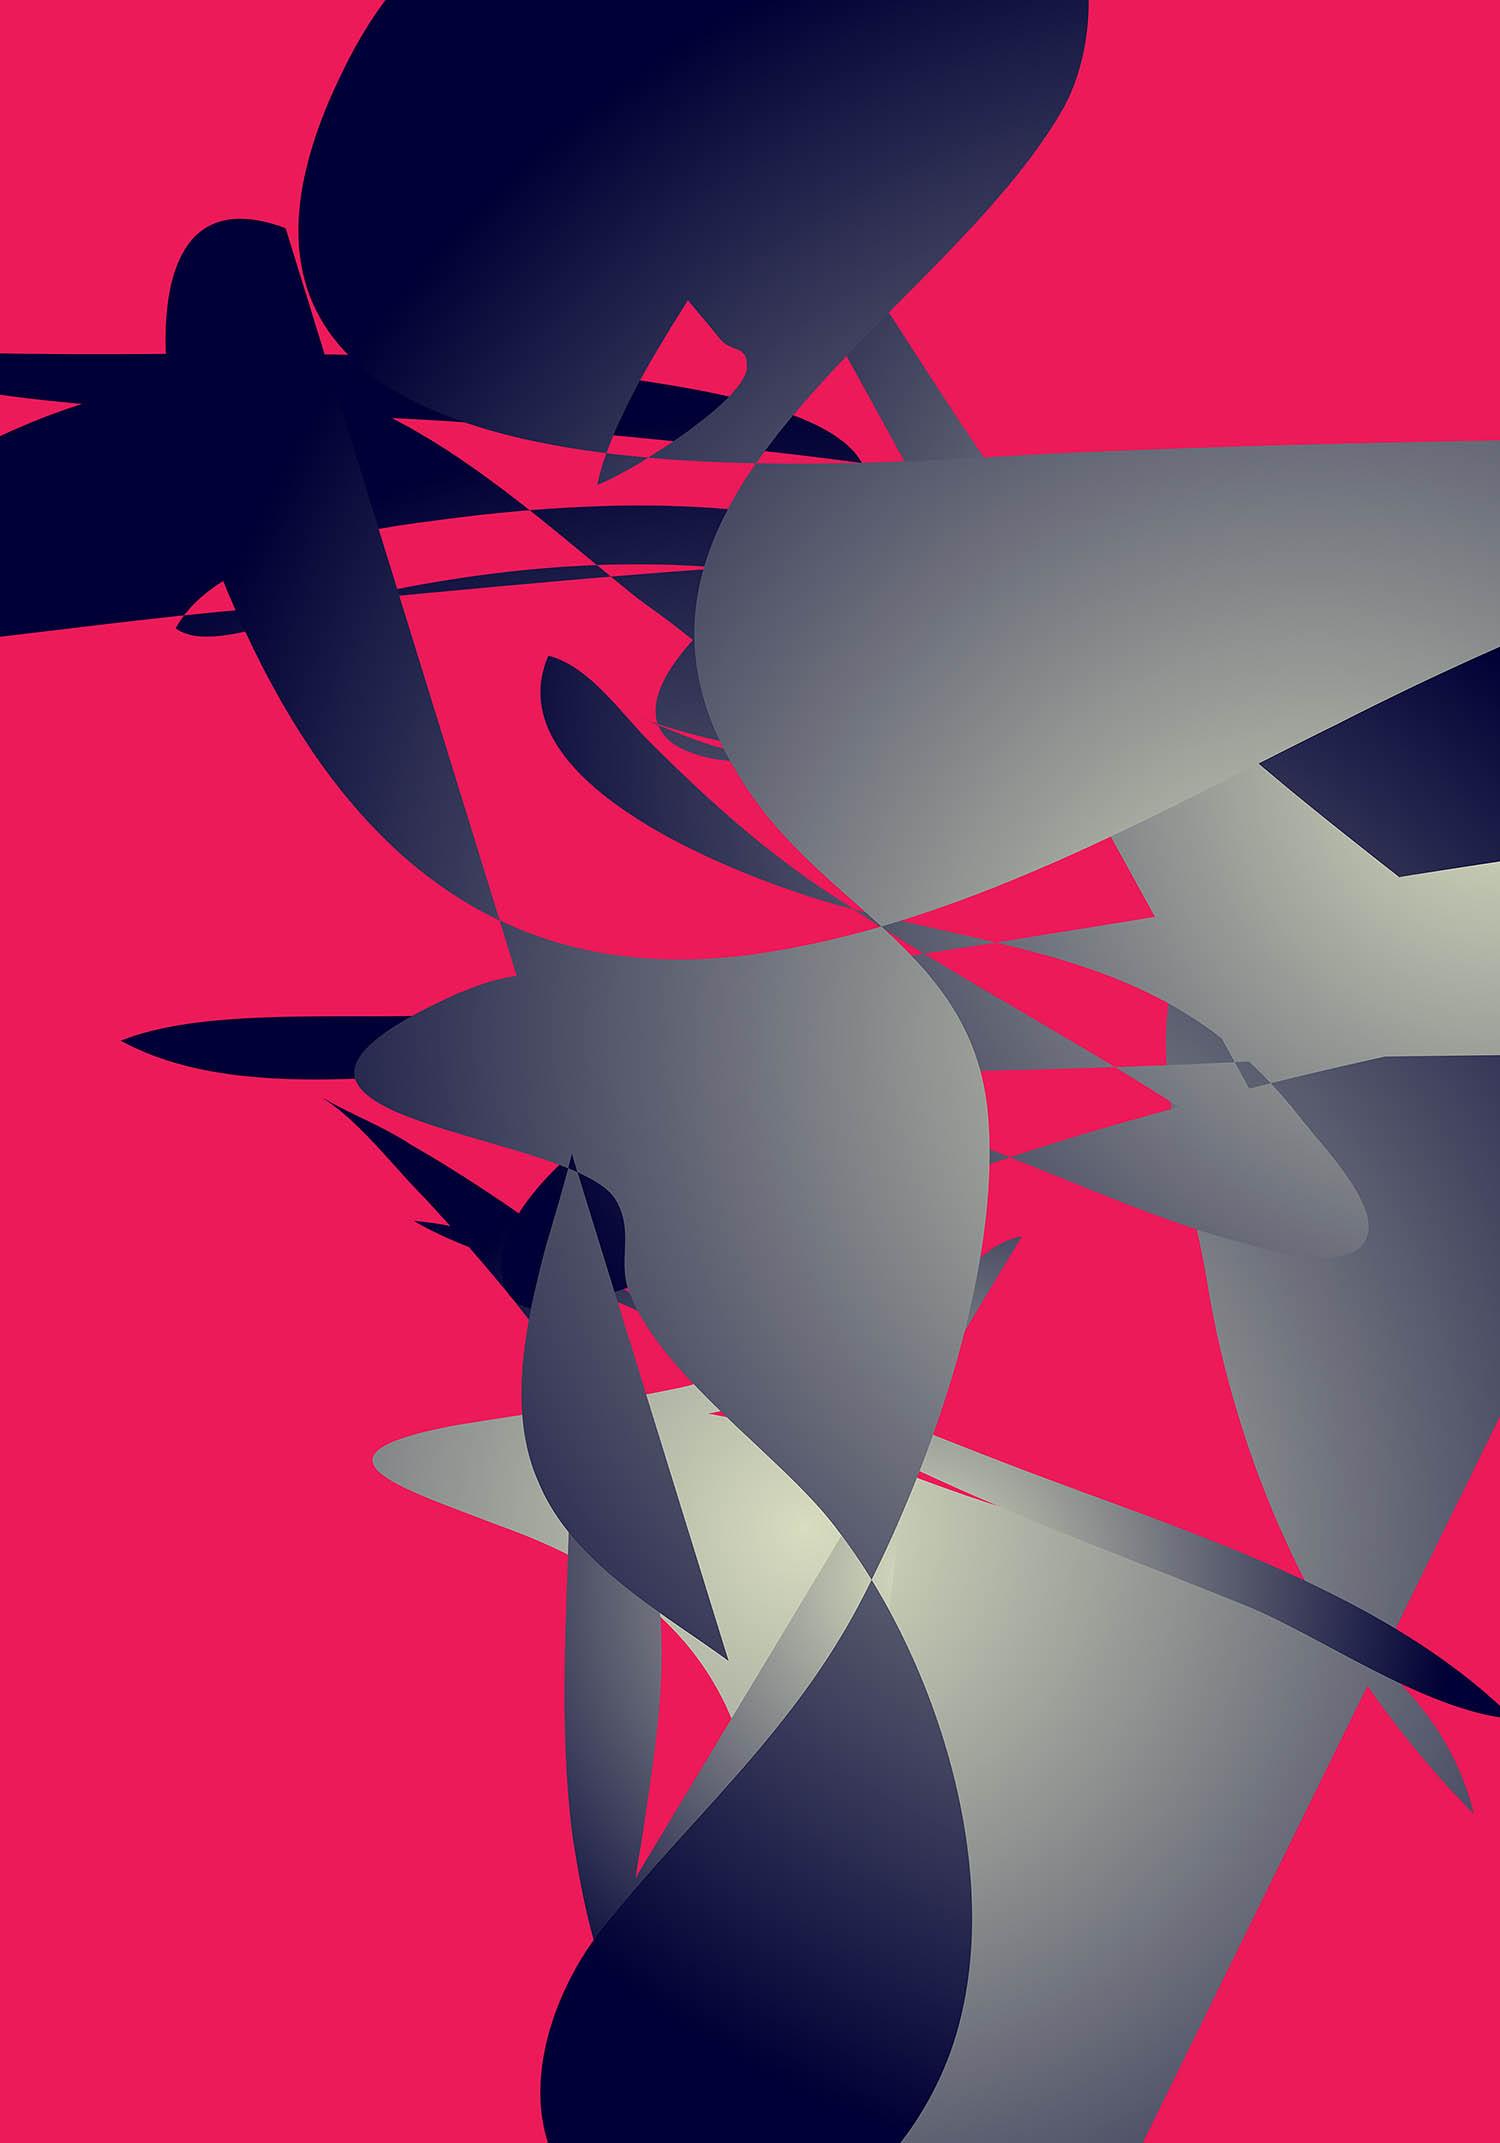 'Covaq 27', Pink & Blue Gray Abstract New Media Art Print by Greek multidisciplinary artist Kostas Gogas.